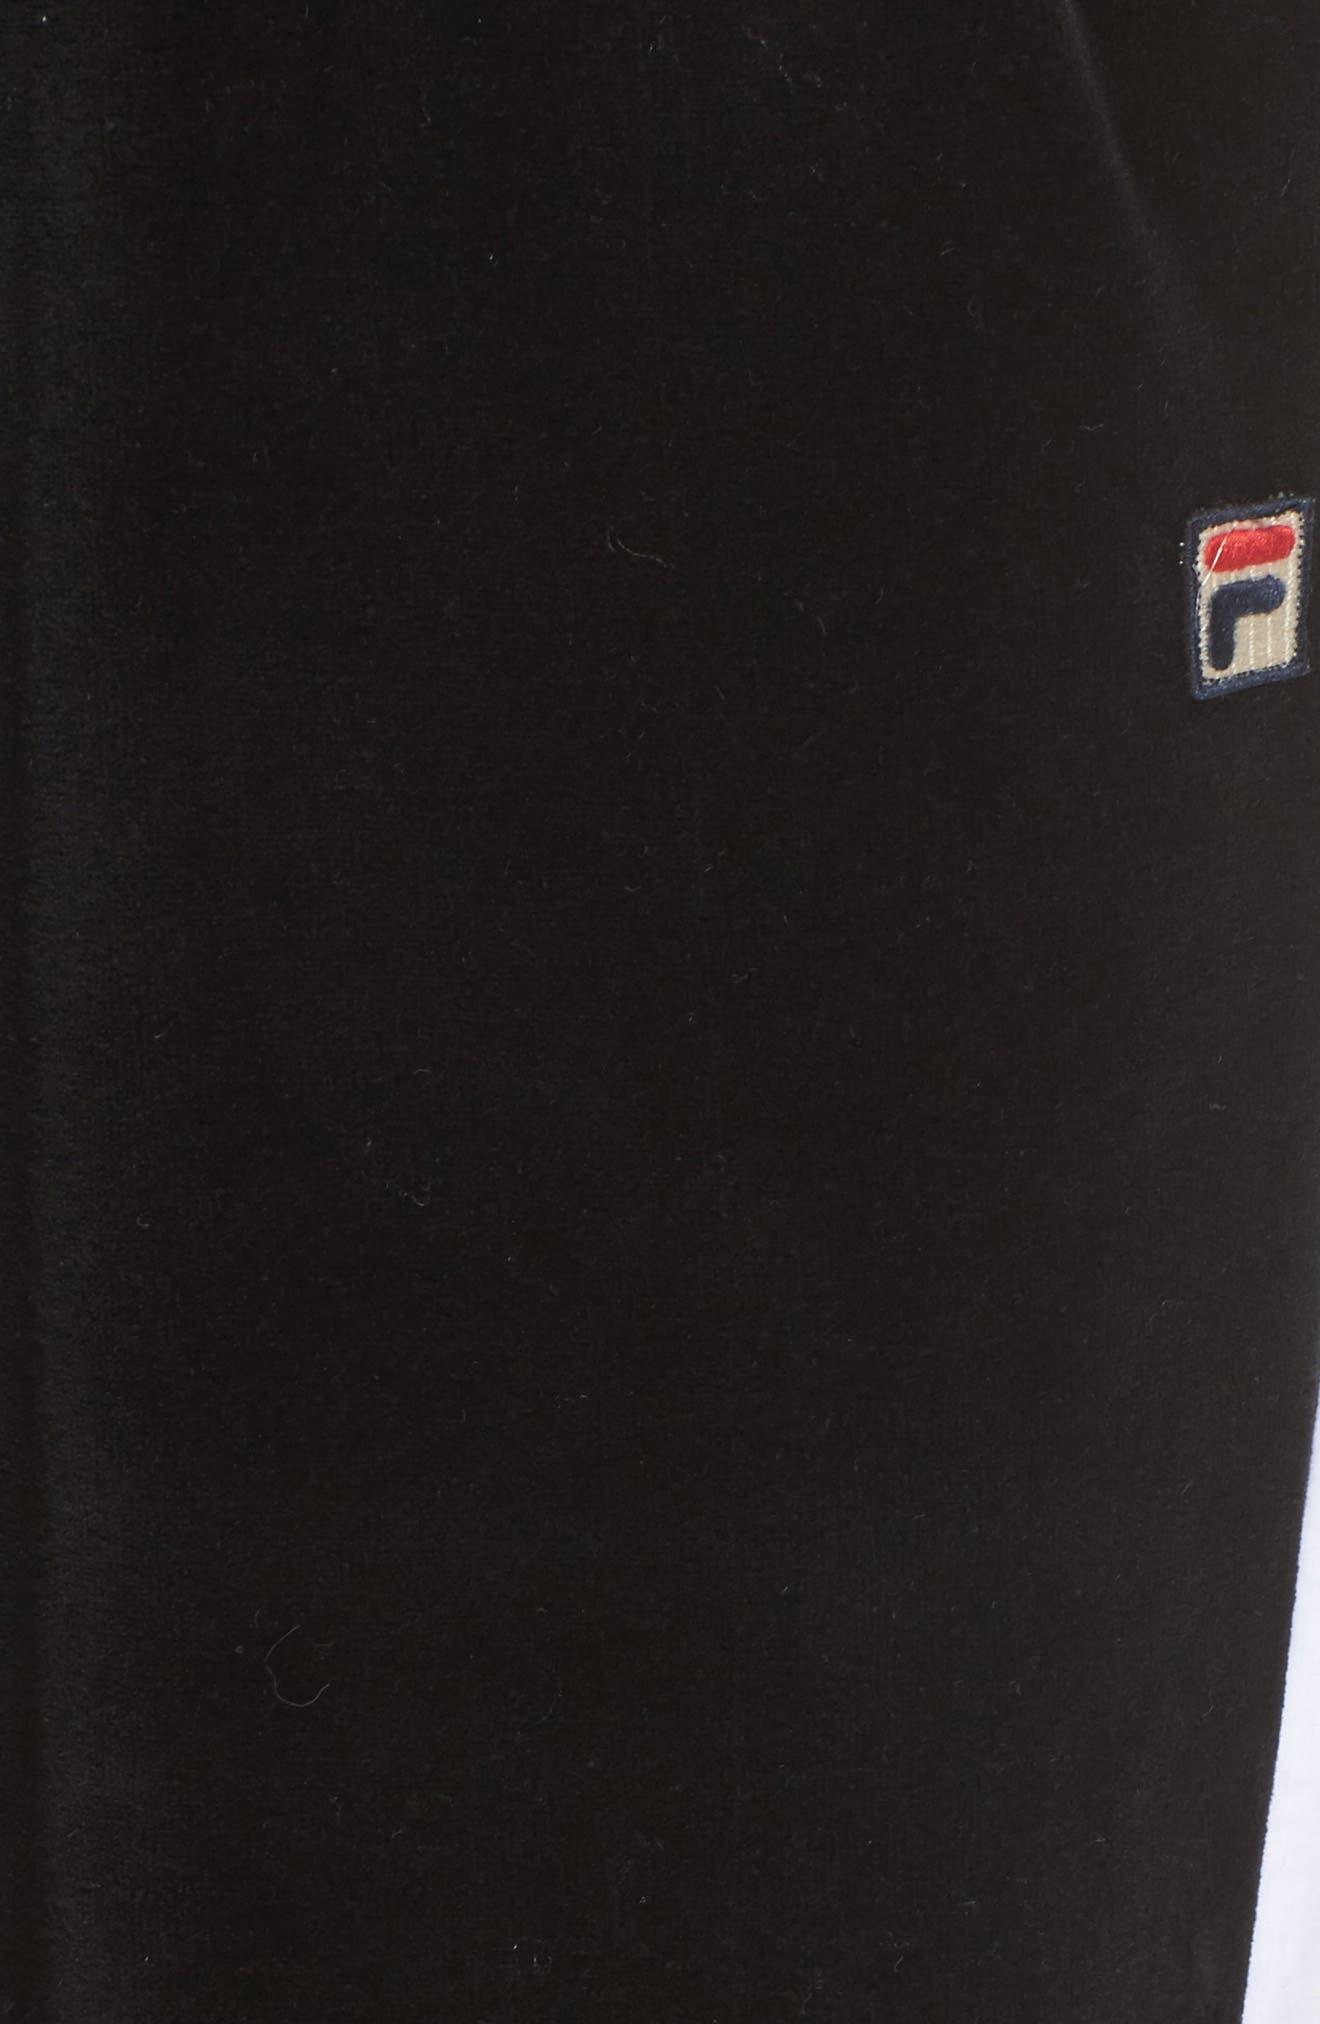 Bonnie Velour Track Pants,                             Alternate thumbnail 6, color,                             Black/ White